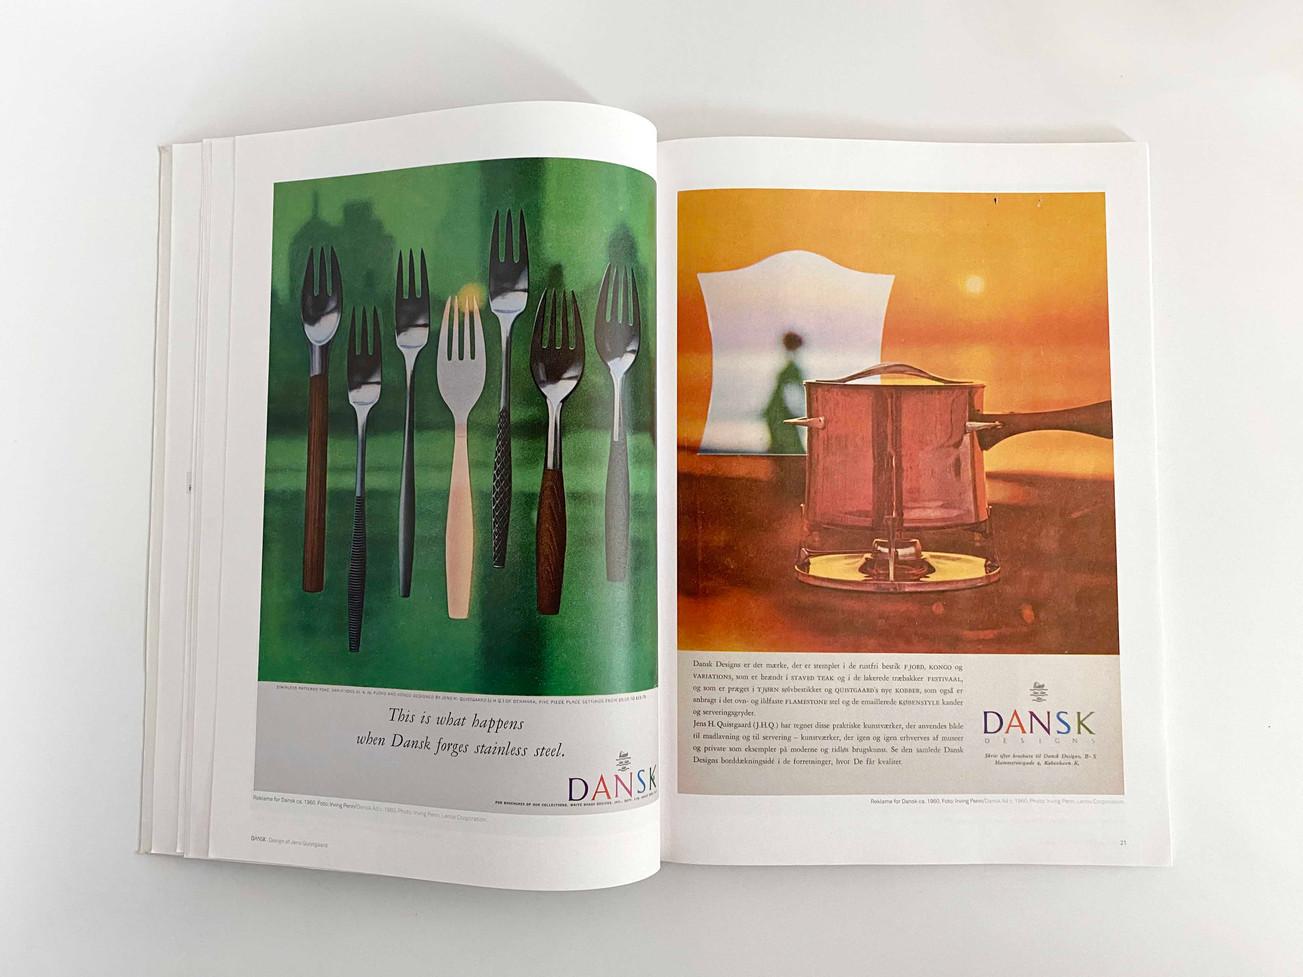 DANSK - Design by Jens Quistgaard